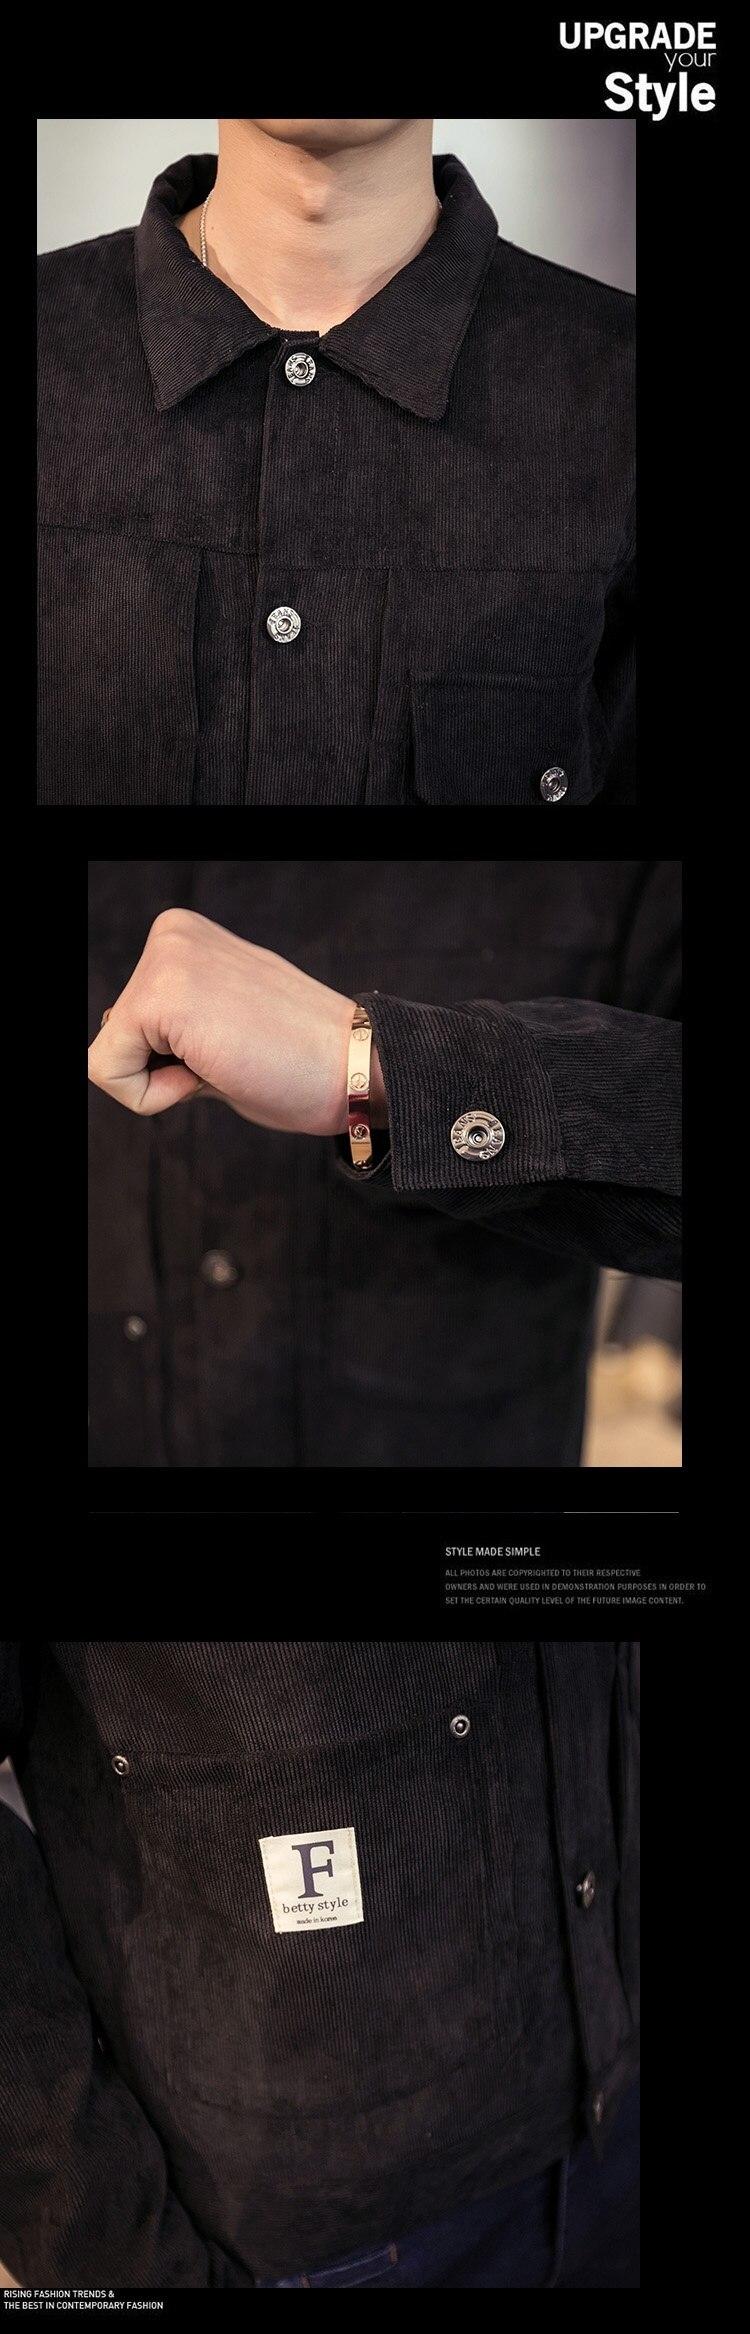 H70c779653aab4addb0c5987e5fa4116cR Zongke Japan Style Corduroy Jacket Men Hip Hop Streetwear Men Jacket Coat Windbreaker Clothes Bomber Jacket Men 5XL 2019 New